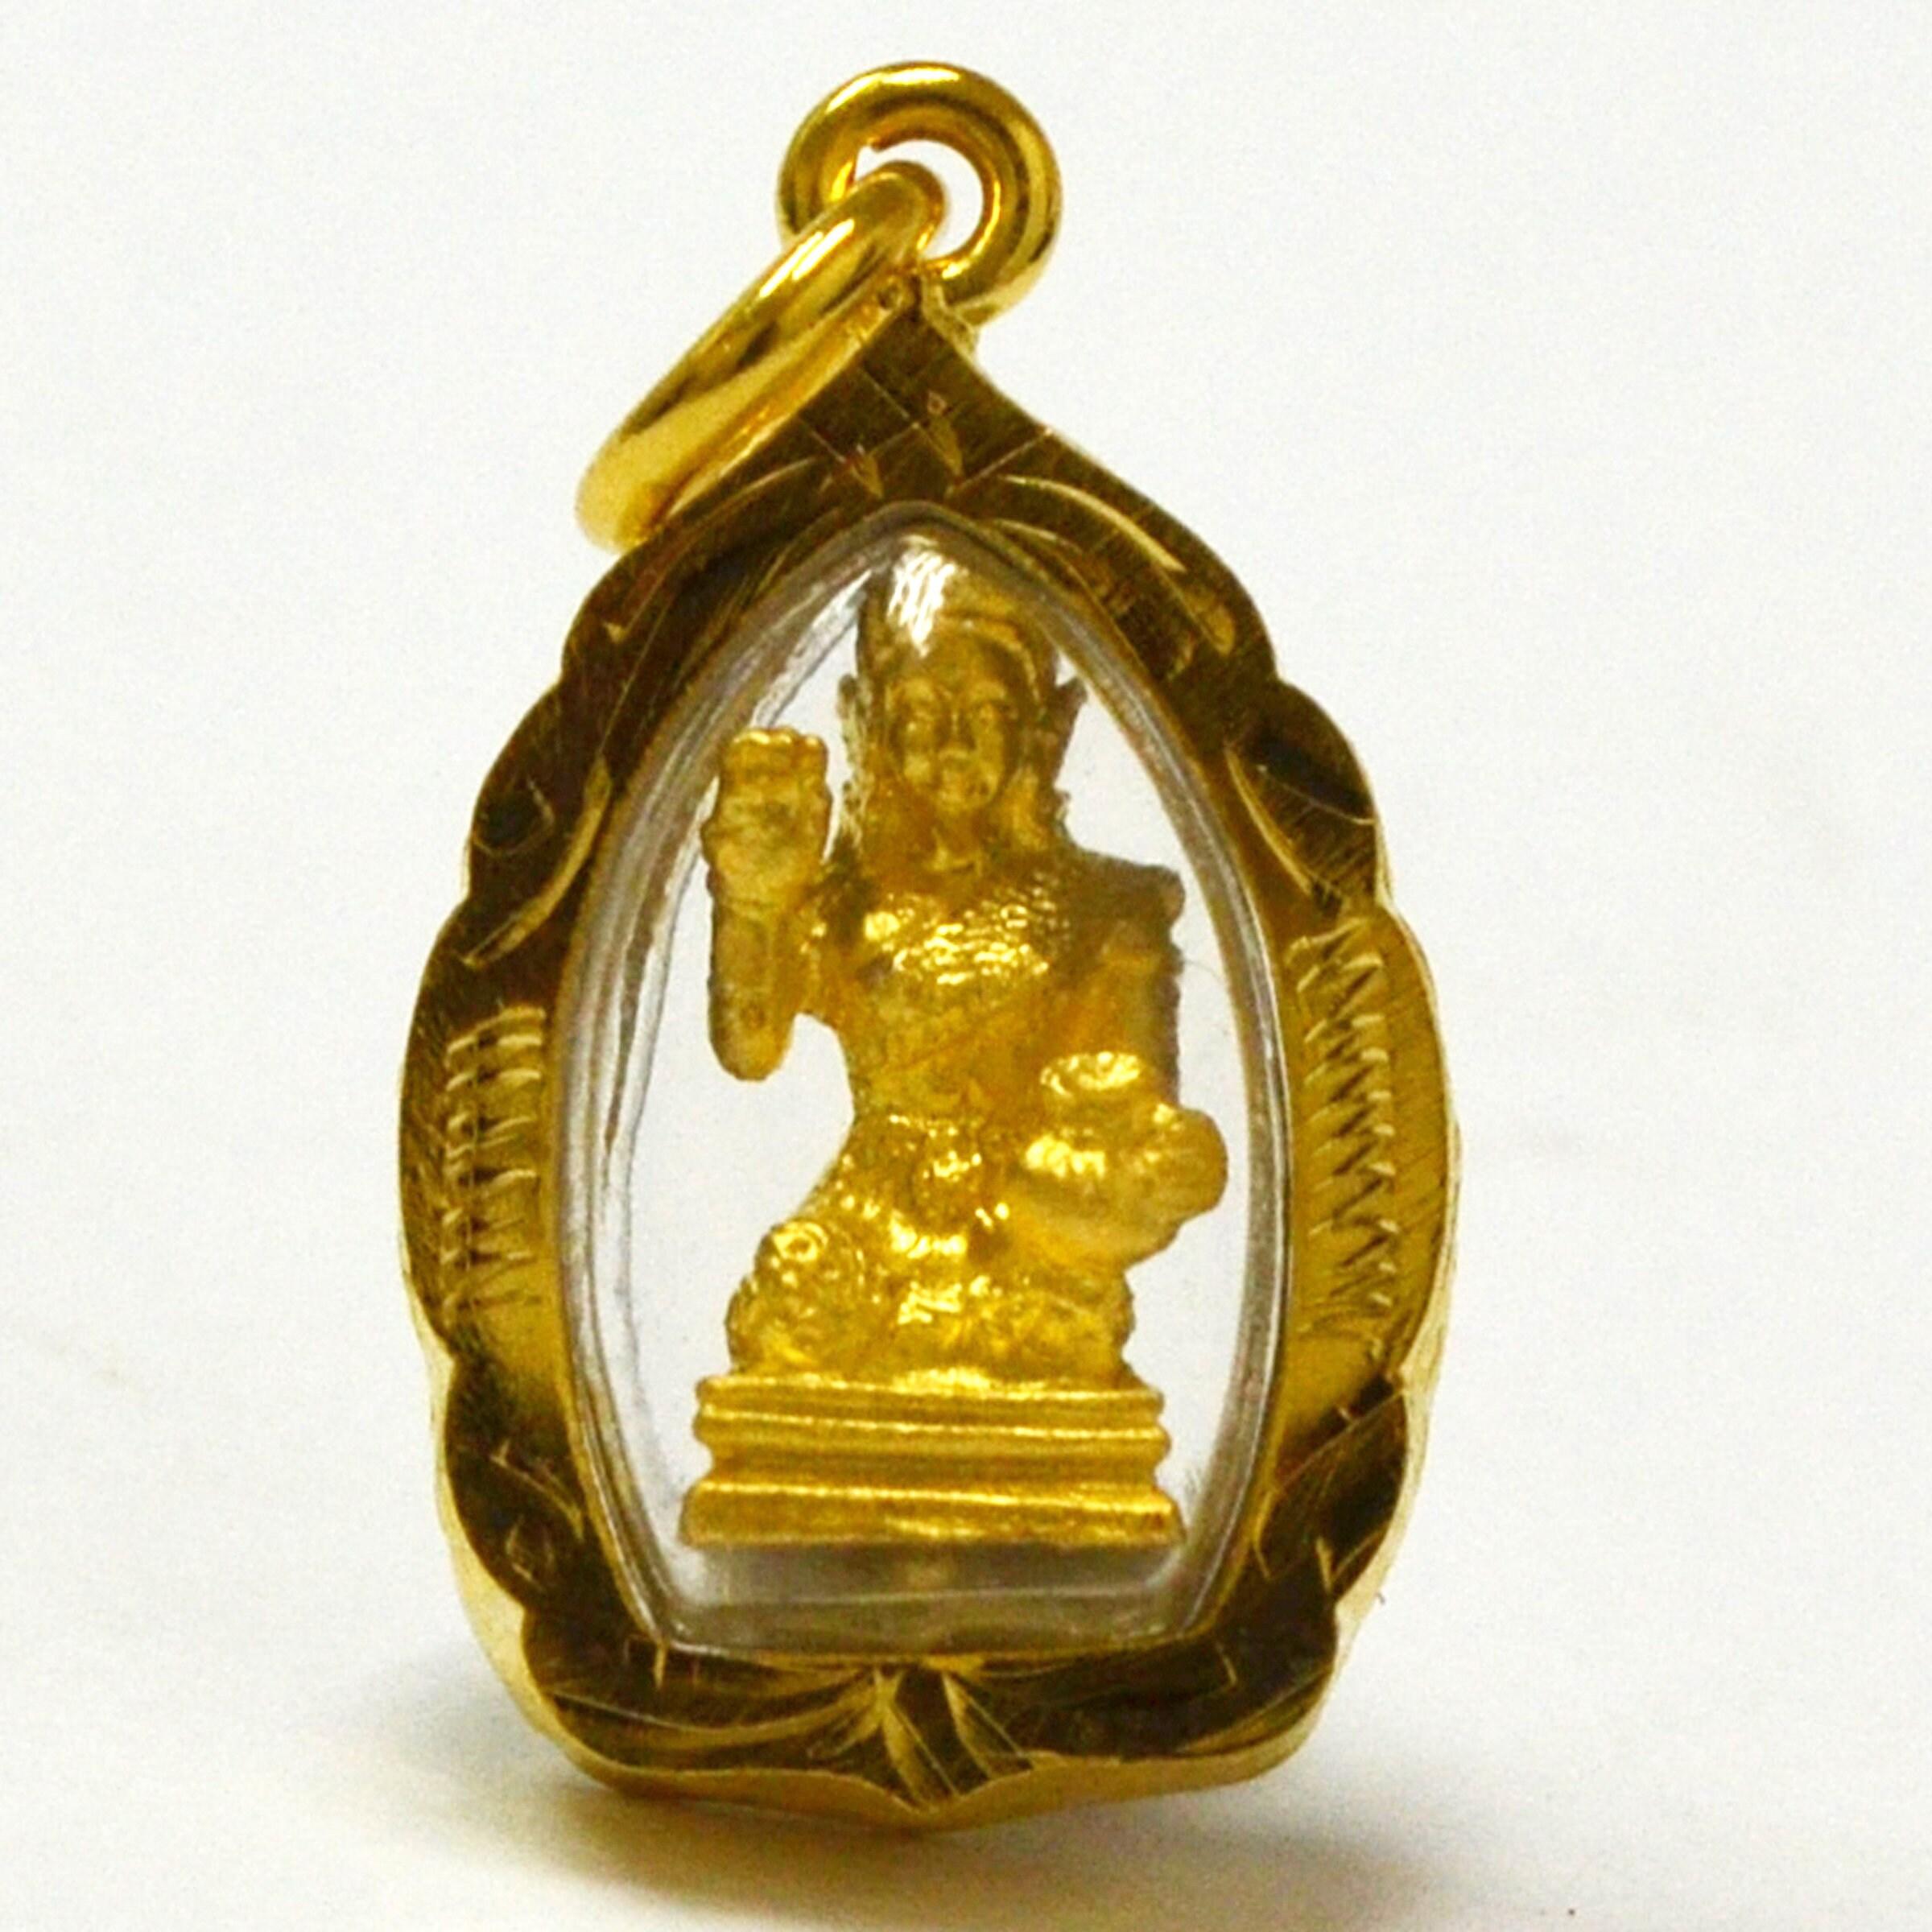 1.Naga  Brass Thai Amulet Monk Buddha  Powerful Magic Rich Wealthy bussiness